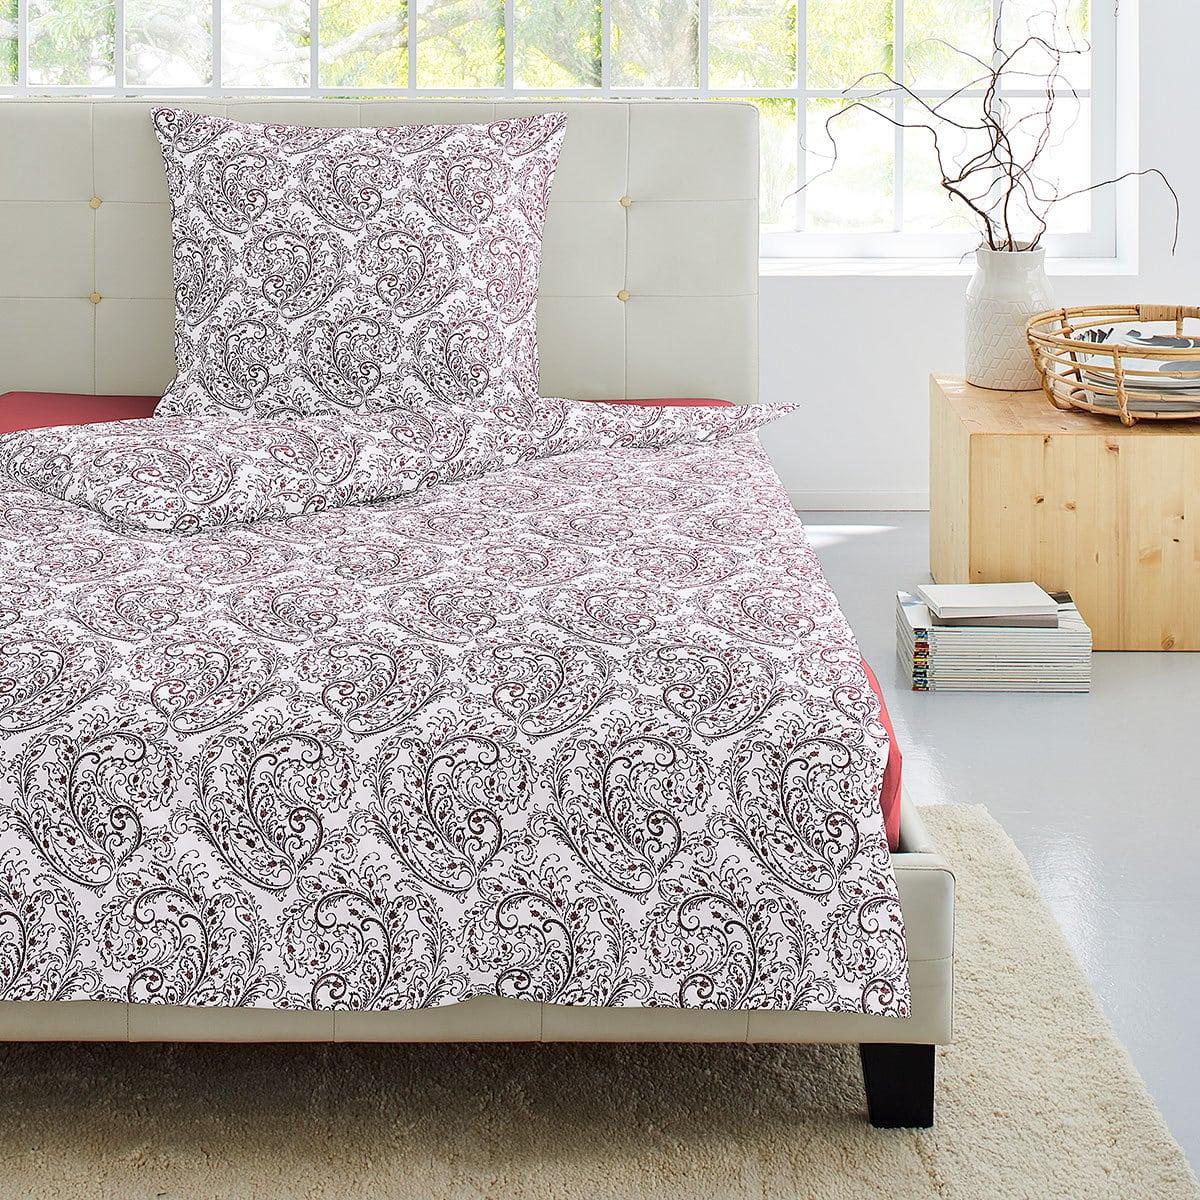 irisette mako satin bettw sche capri 8746 60 g nstig online kaufen bei bettwaren shop. Black Bedroom Furniture Sets. Home Design Ideas